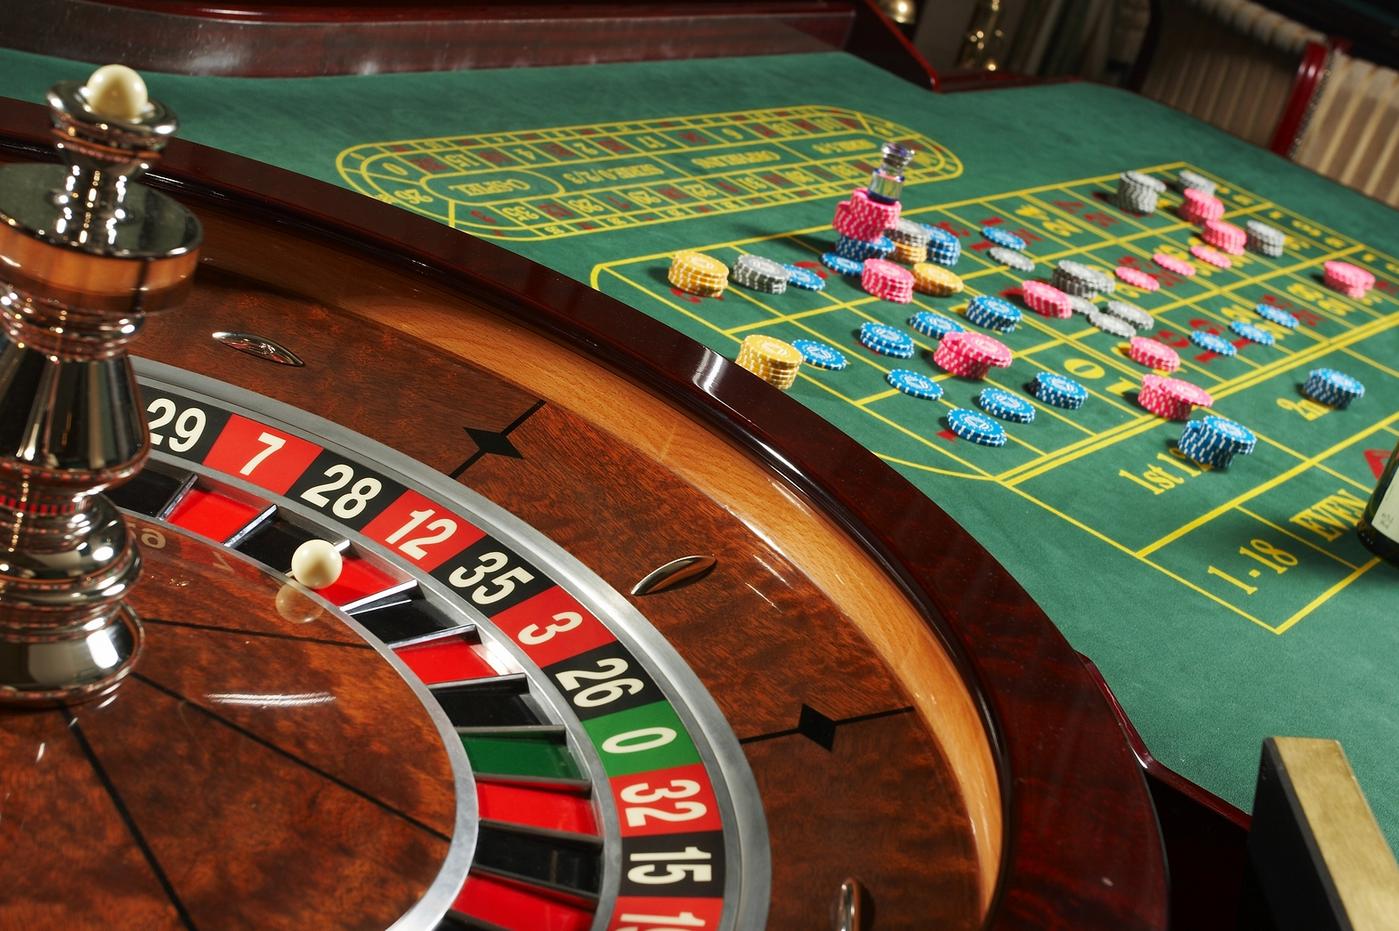 рулетка картинка казино